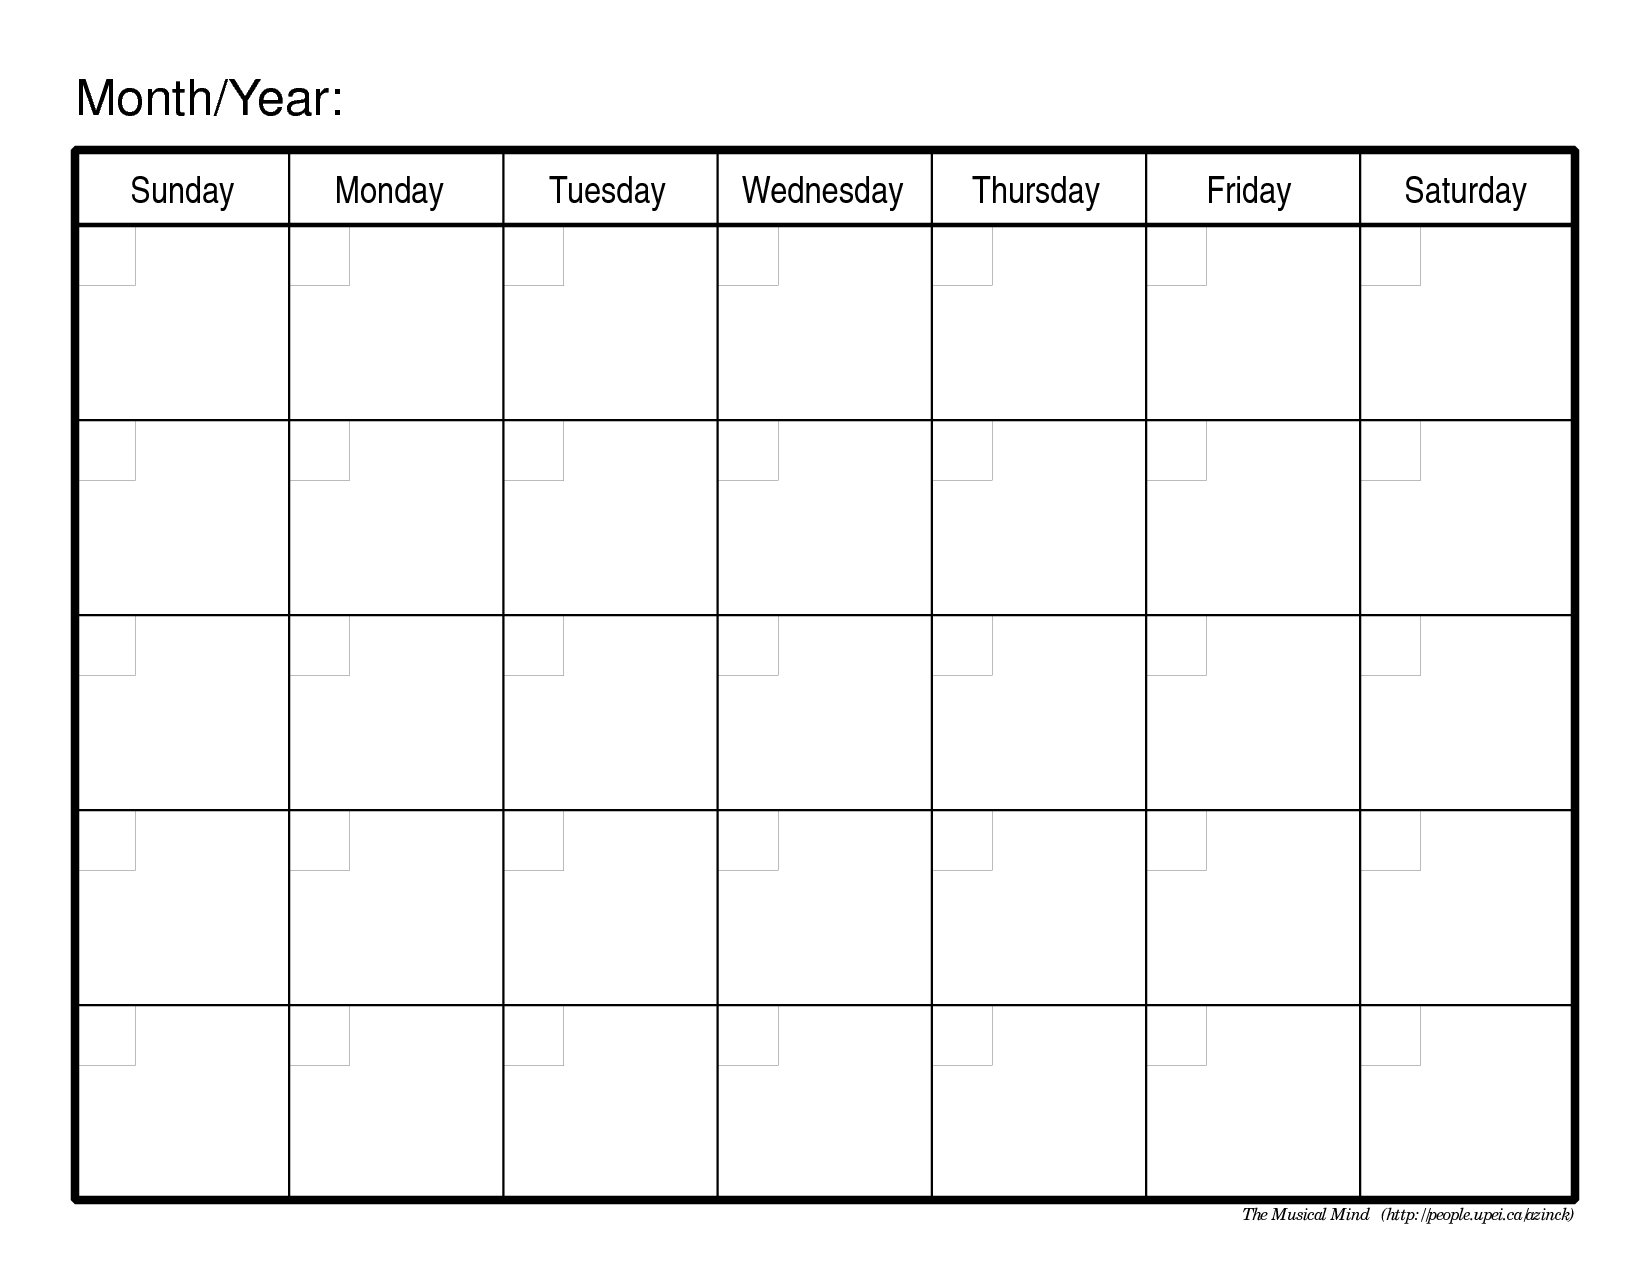 Monthly Schedule Calendar Template – Printable Schedule Free Calendar Template To Populate